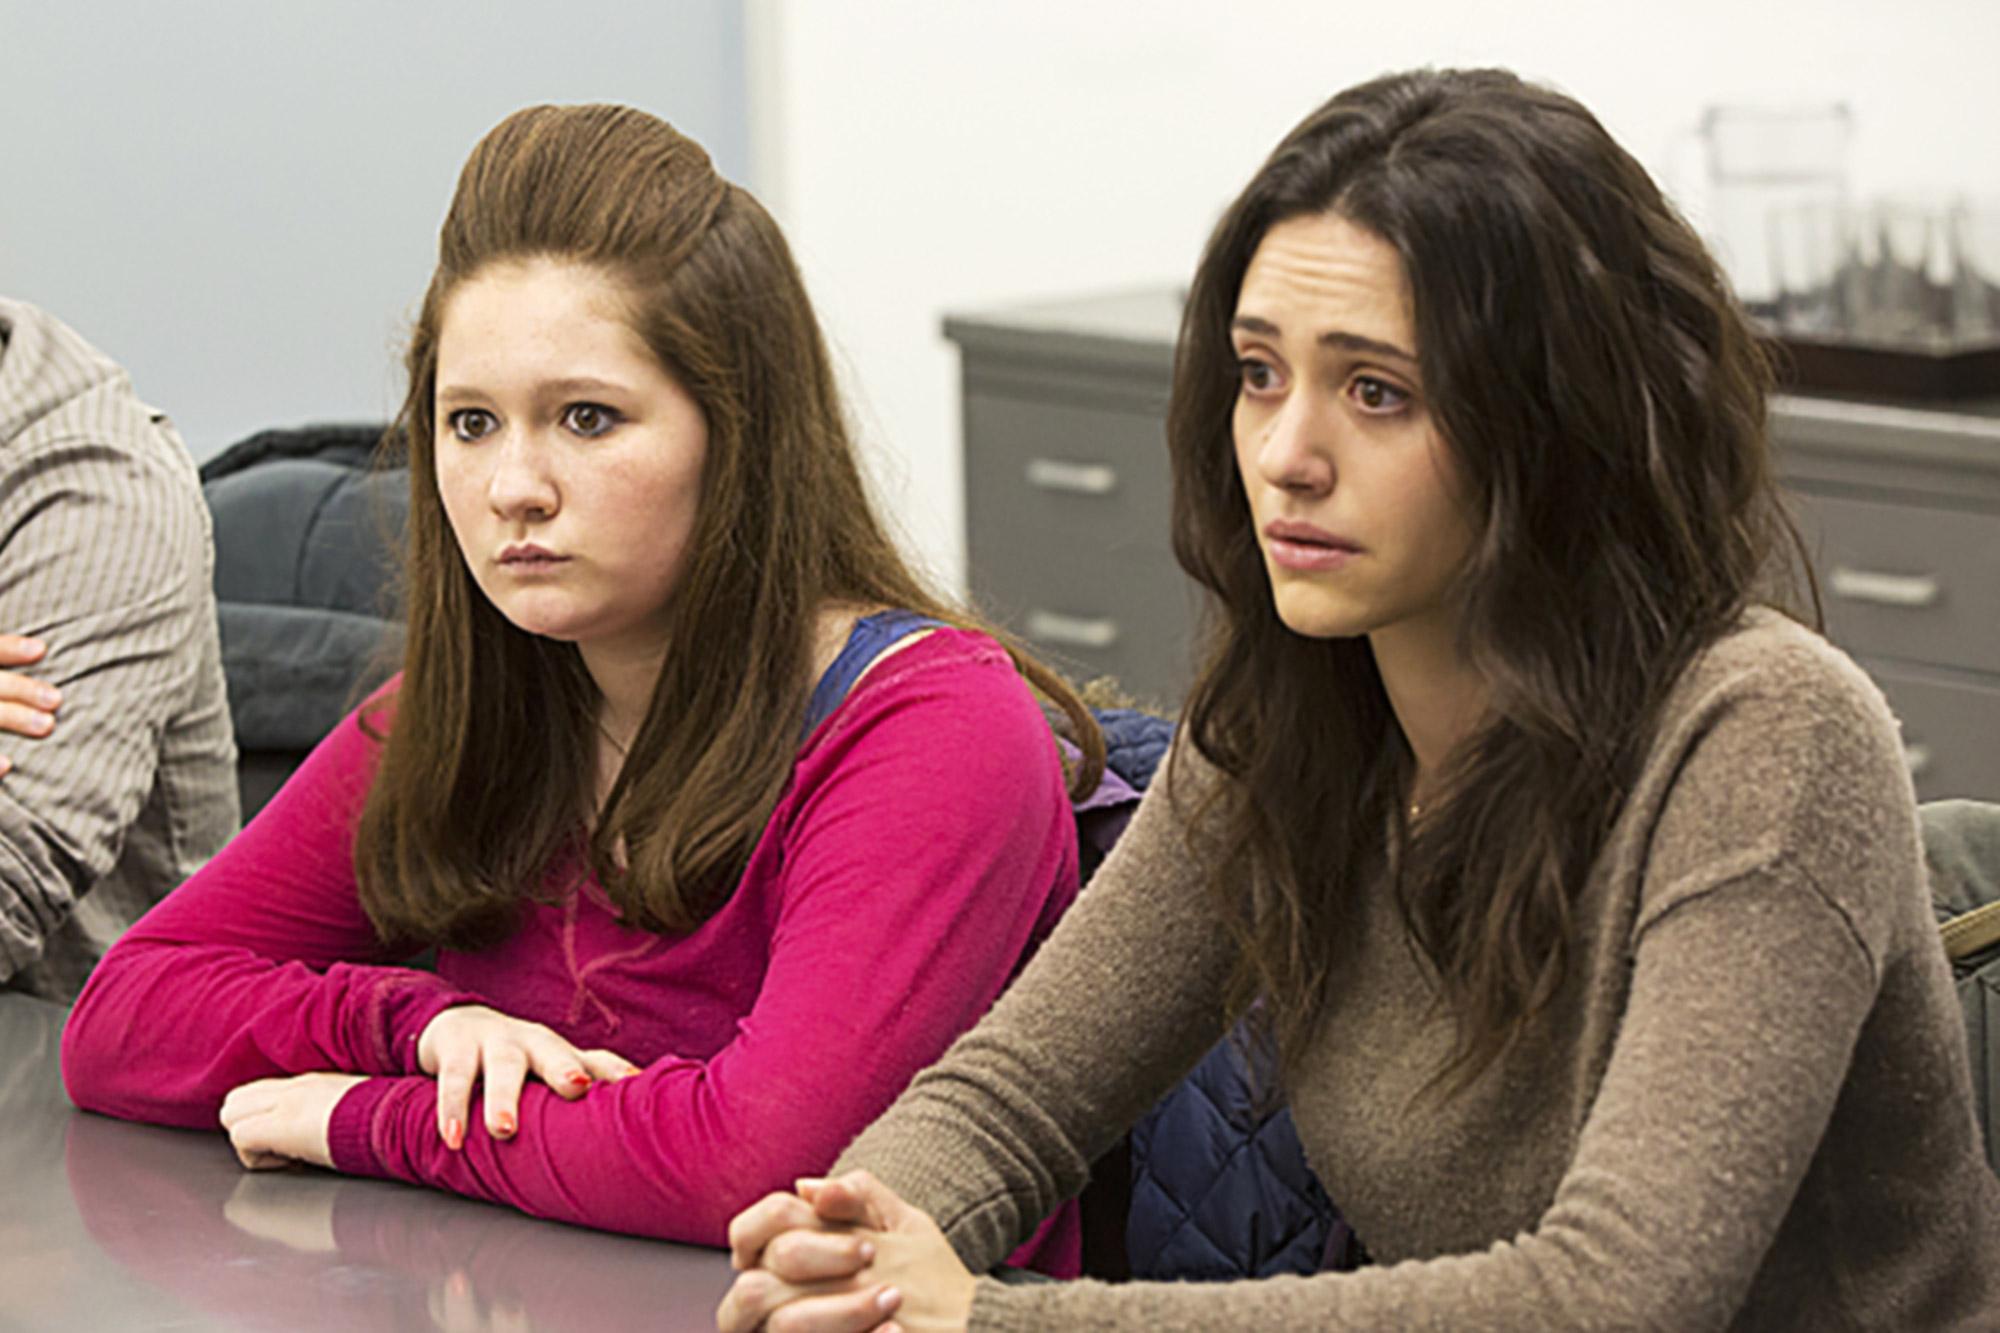 Emma Kenney and Emmy Rossum